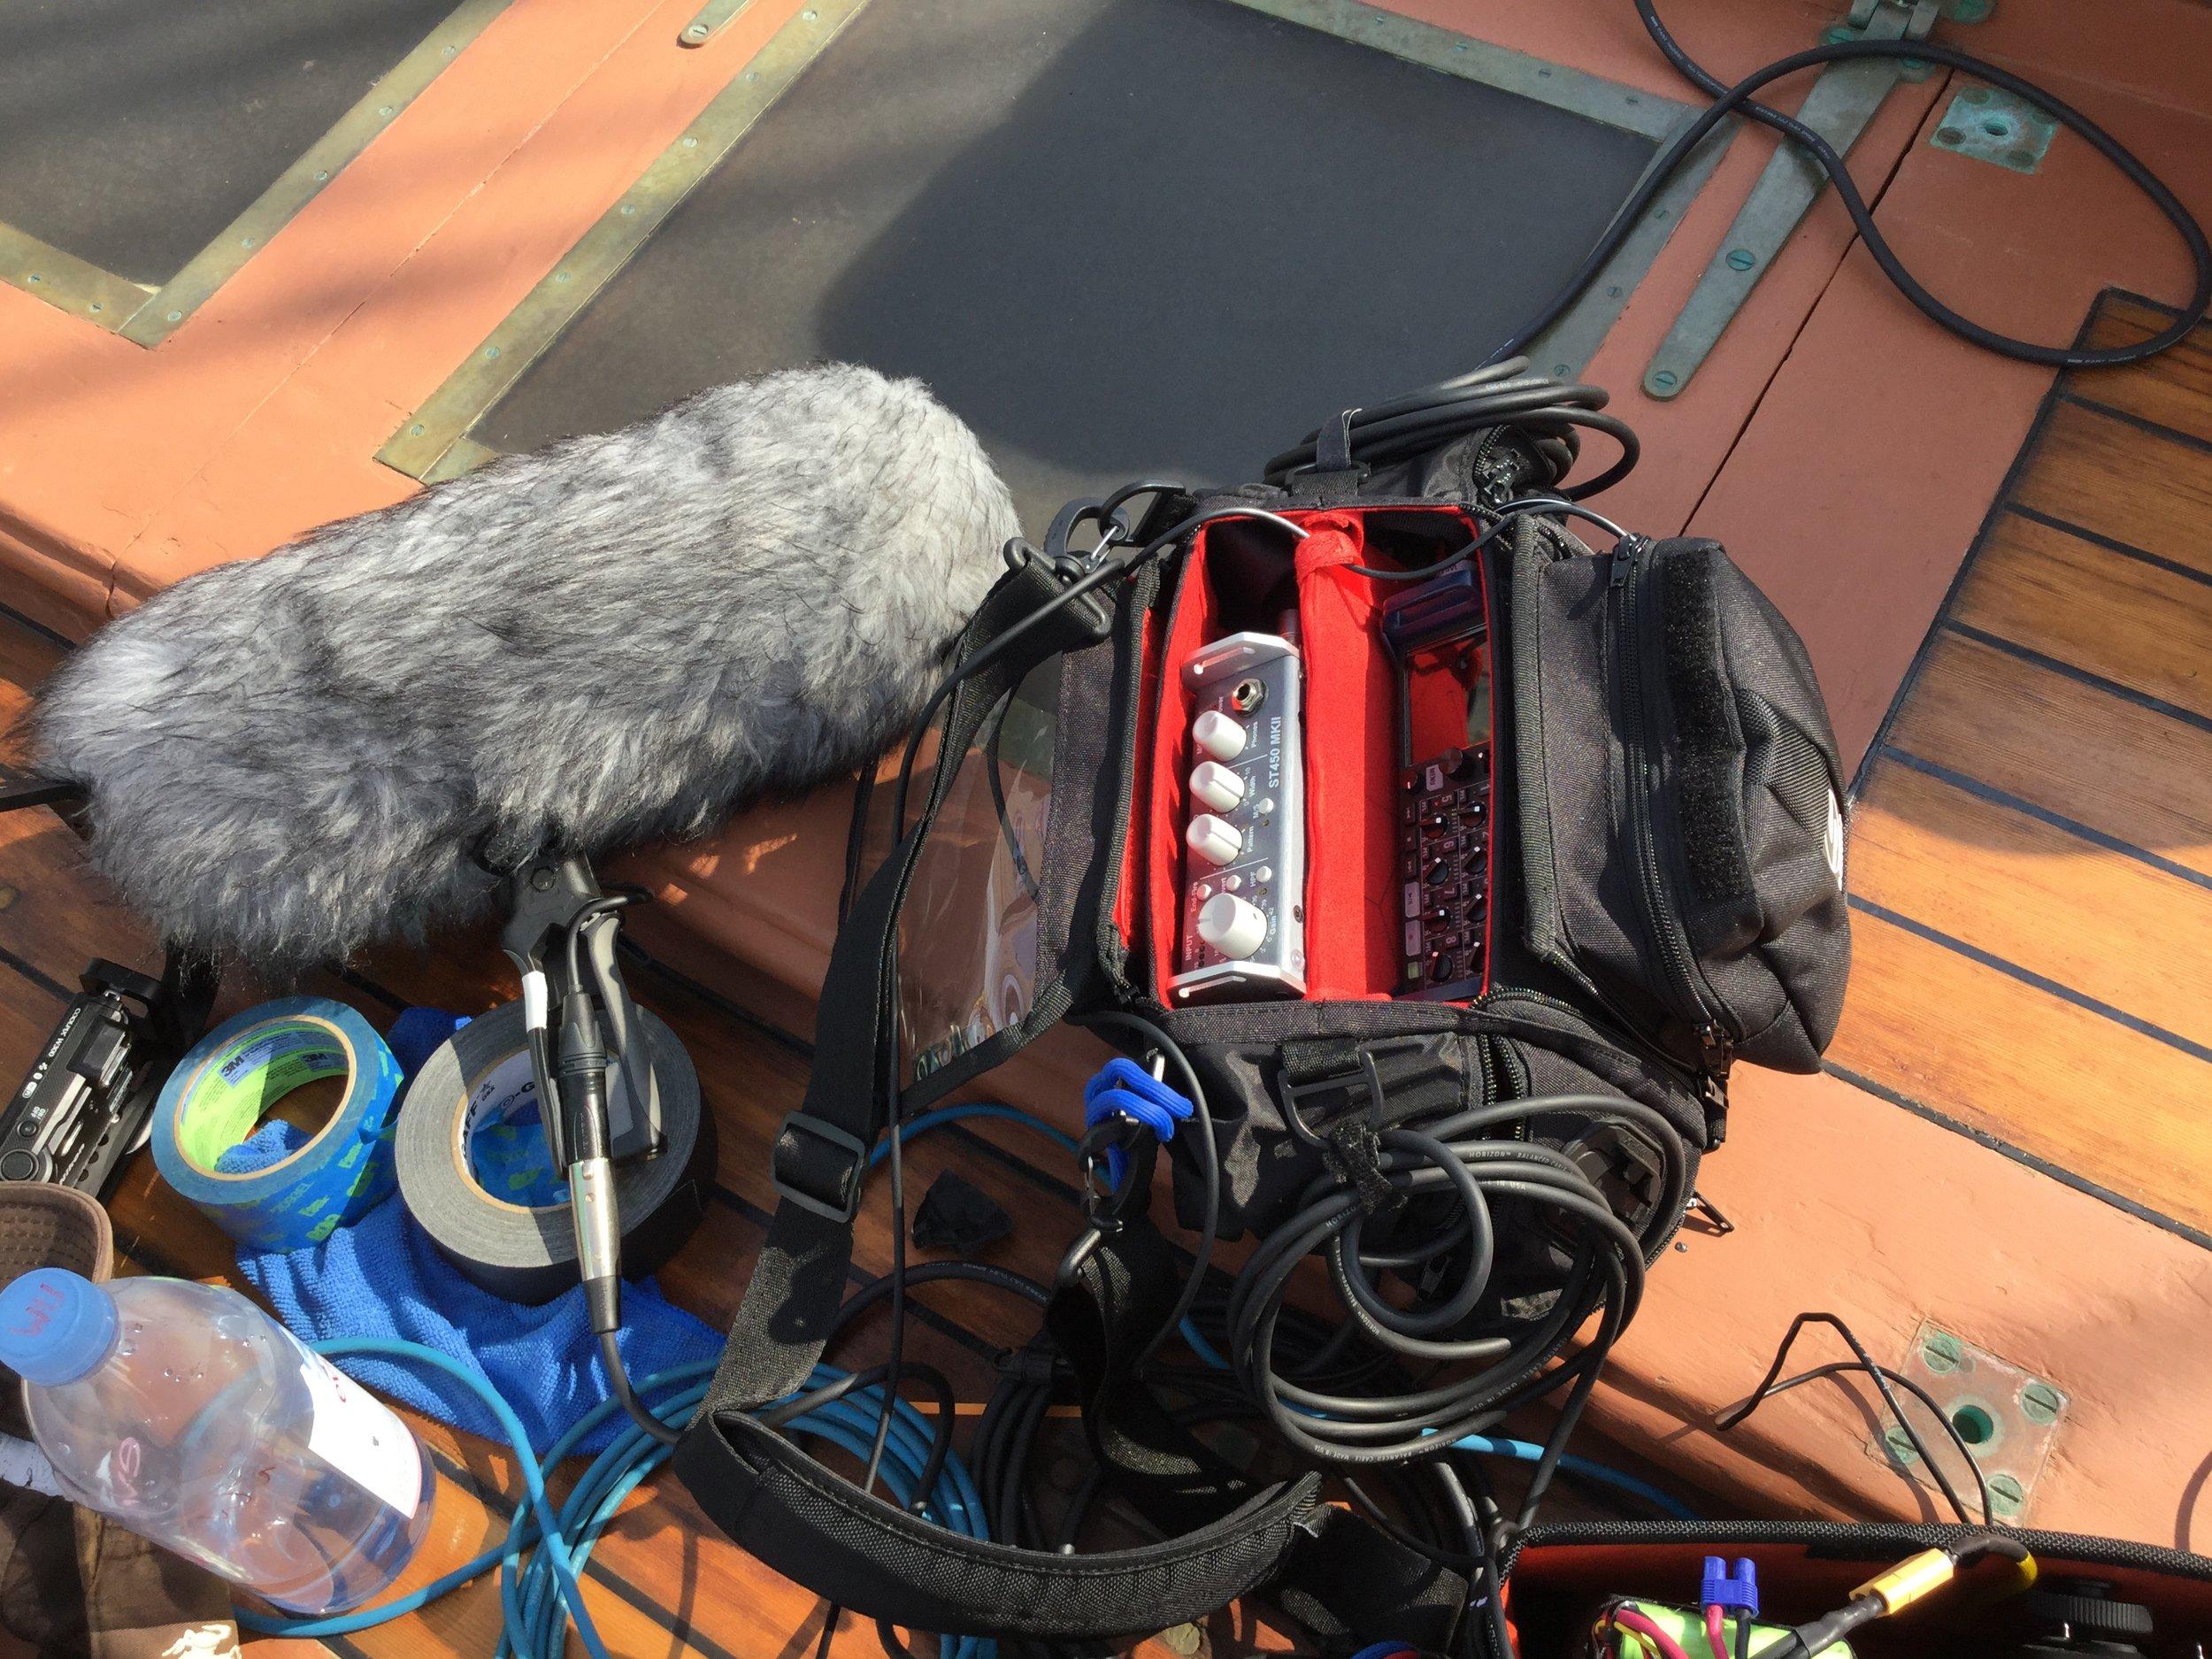 IMG_0352 Recording Rig.JPG